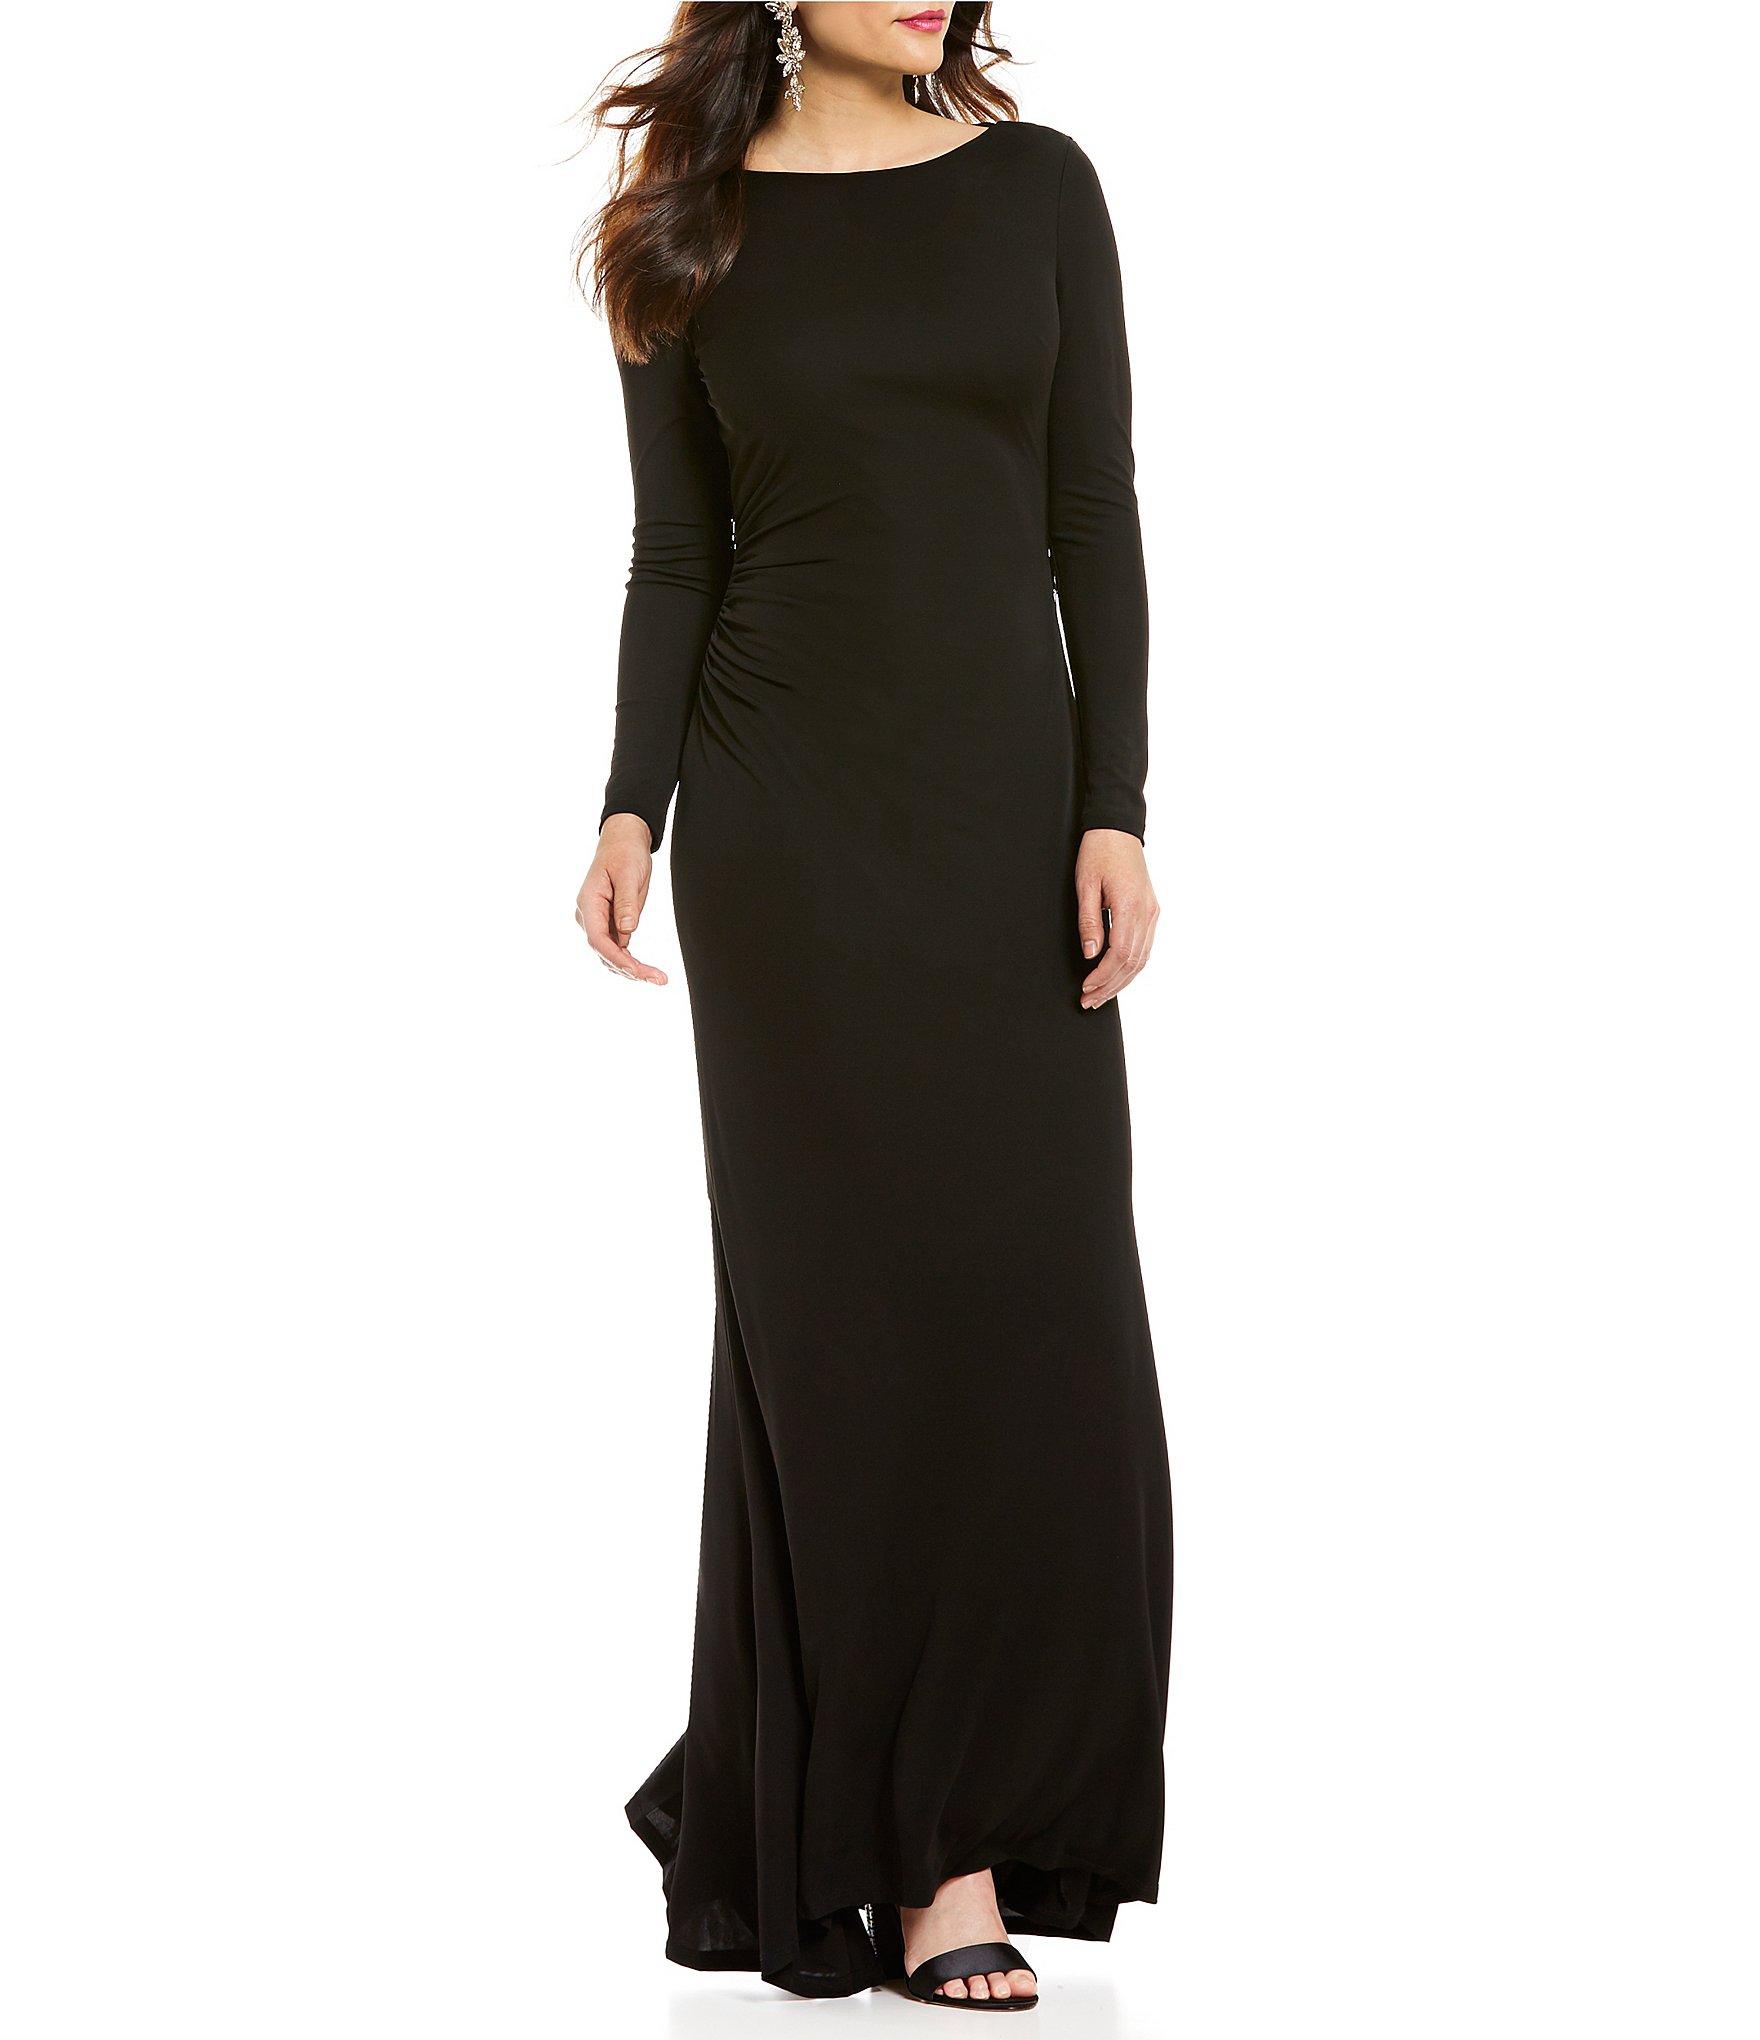 Black dress long sleeve - Black Dress Long Sleeve 40